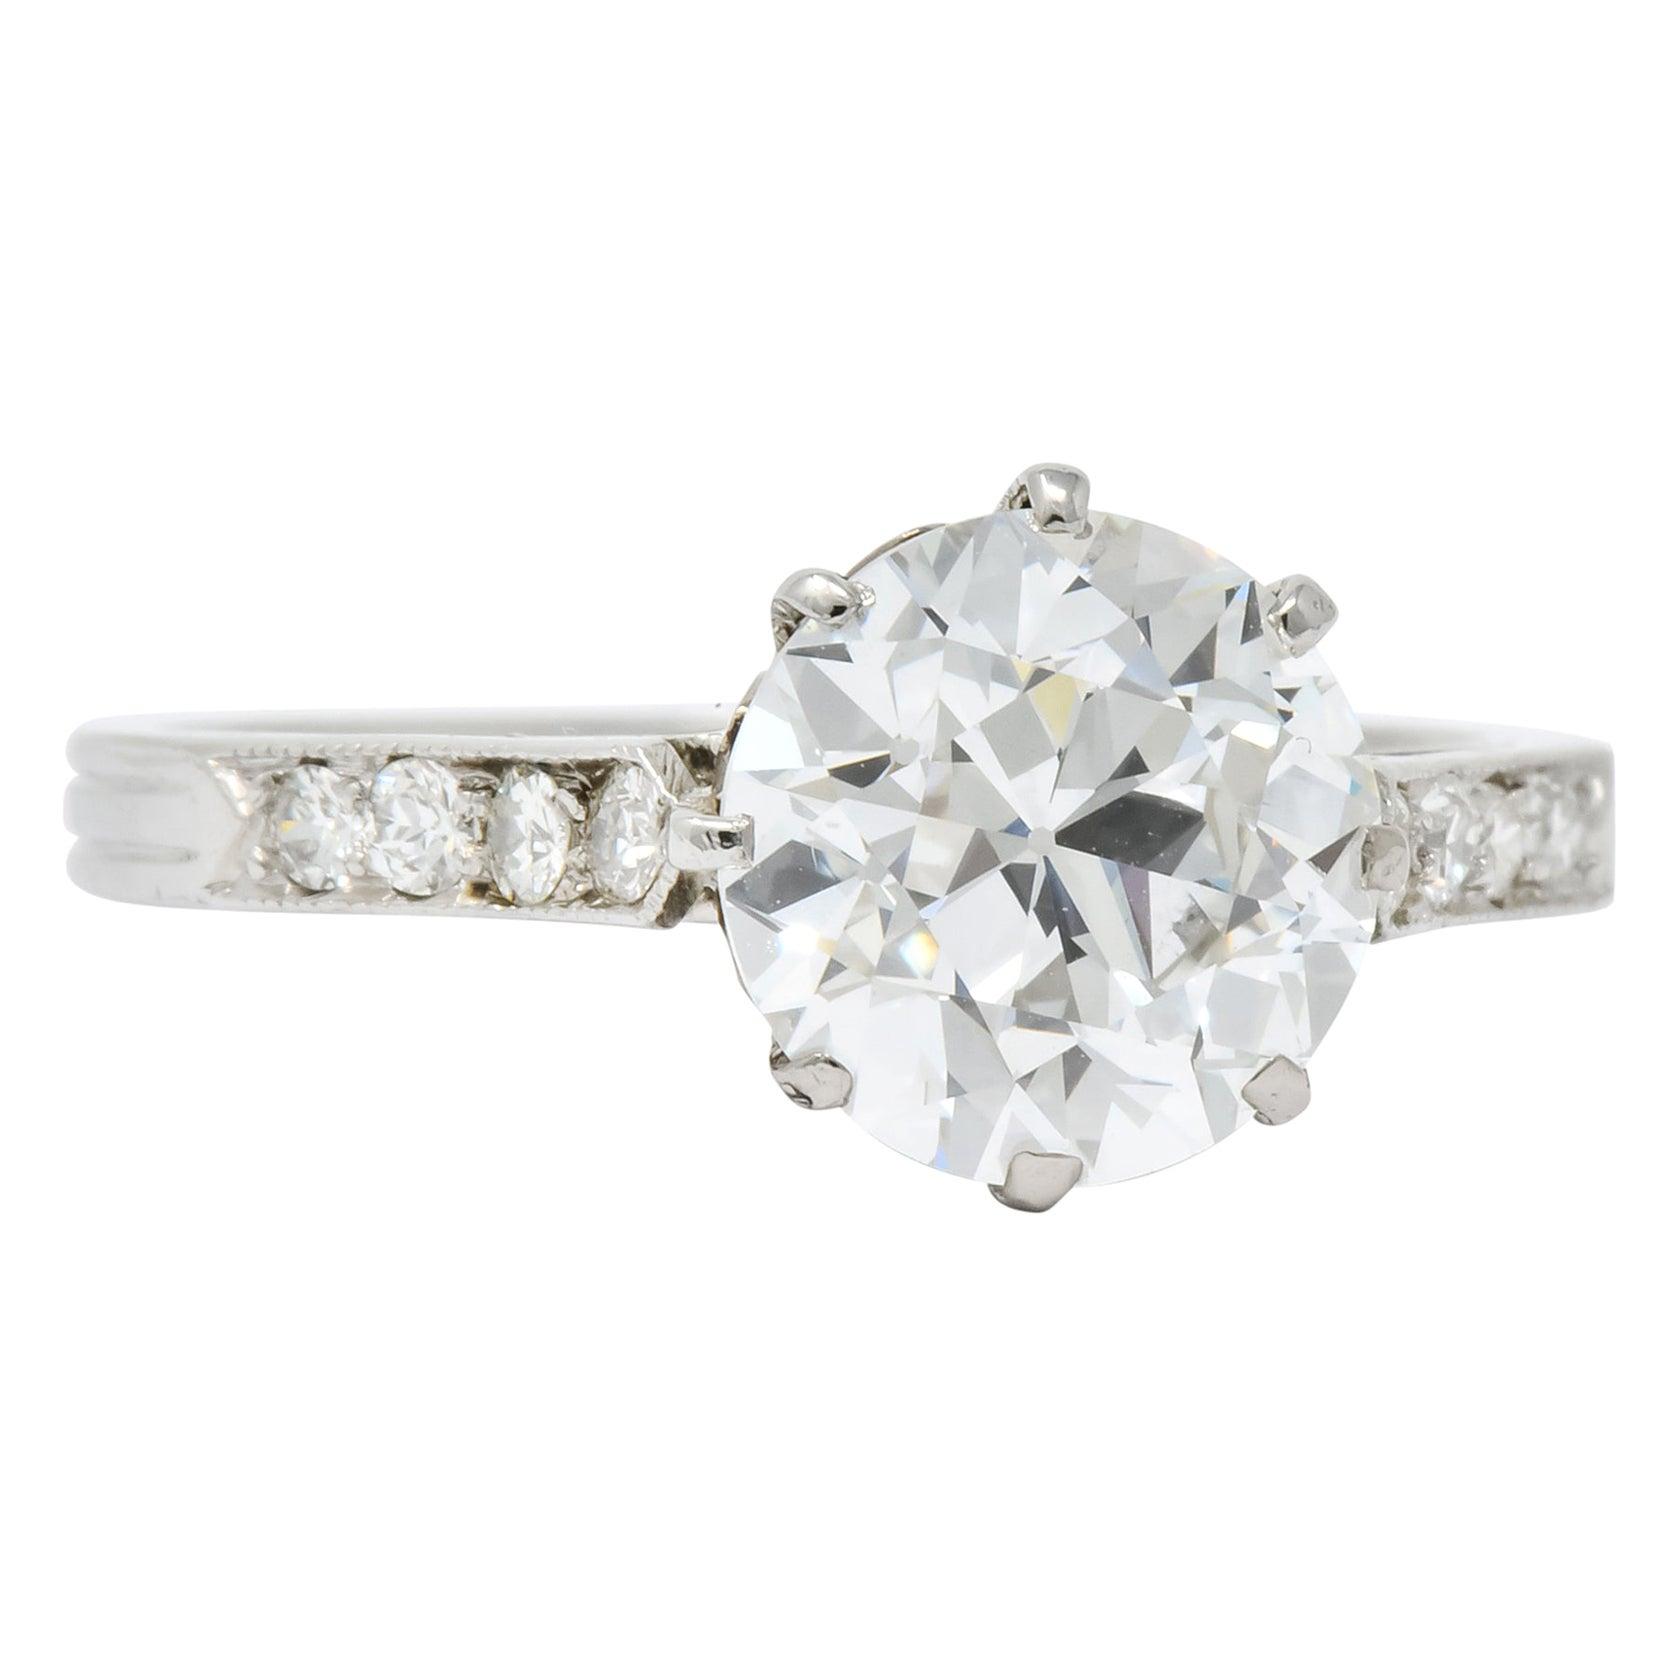 Enticing Edwardian 2.68 Carat Diamond Platinum Engagement Ring GIA